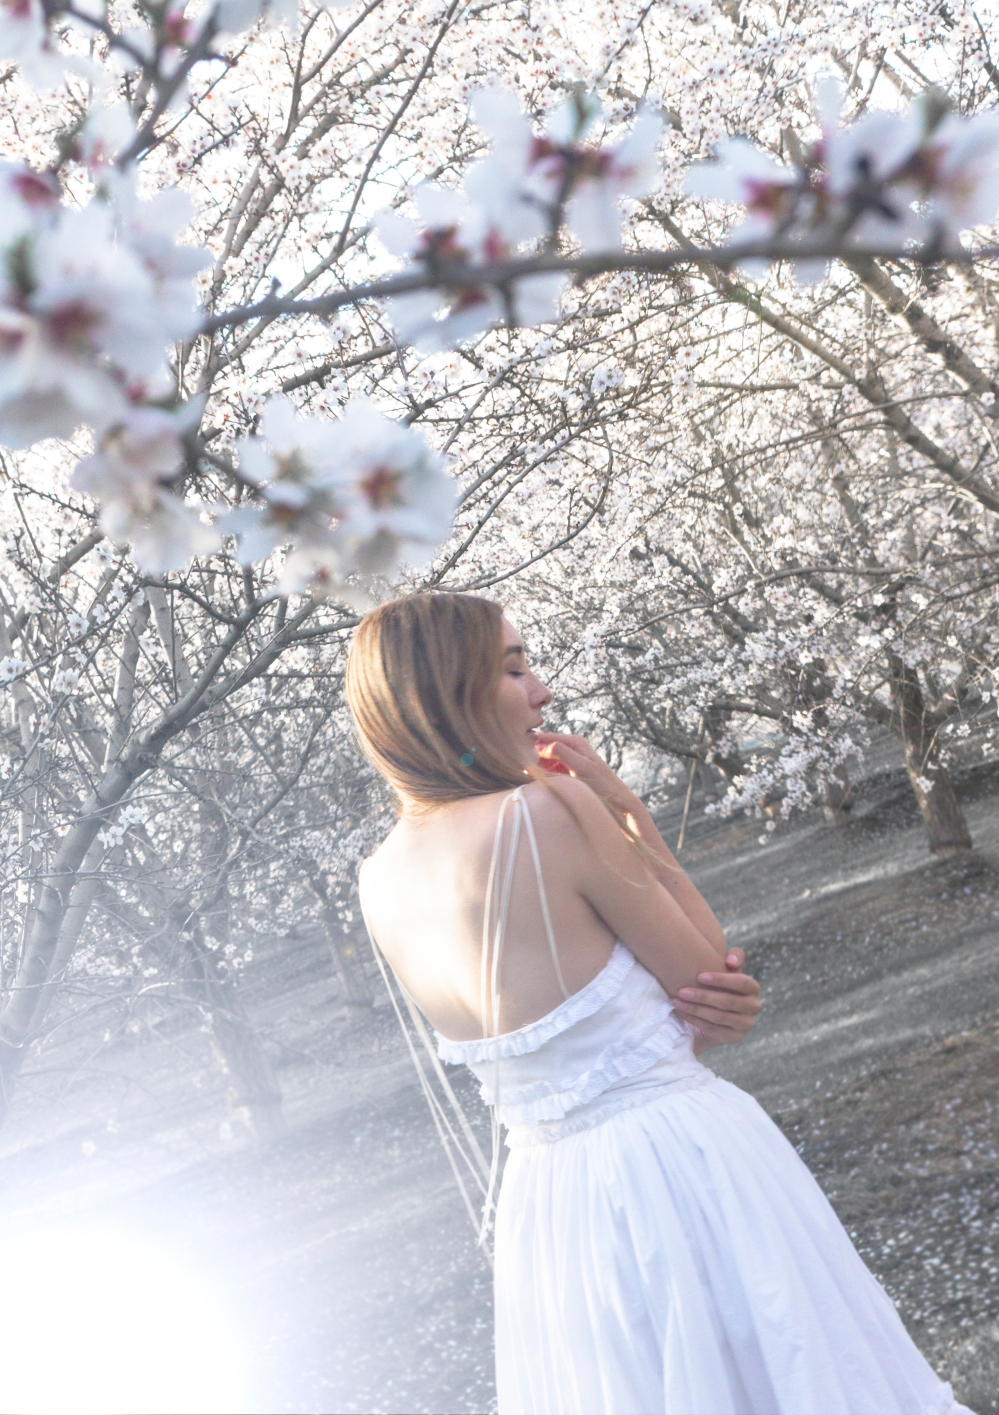 Alyssa_Nicole_Spring_2018_Blossom_4965 2